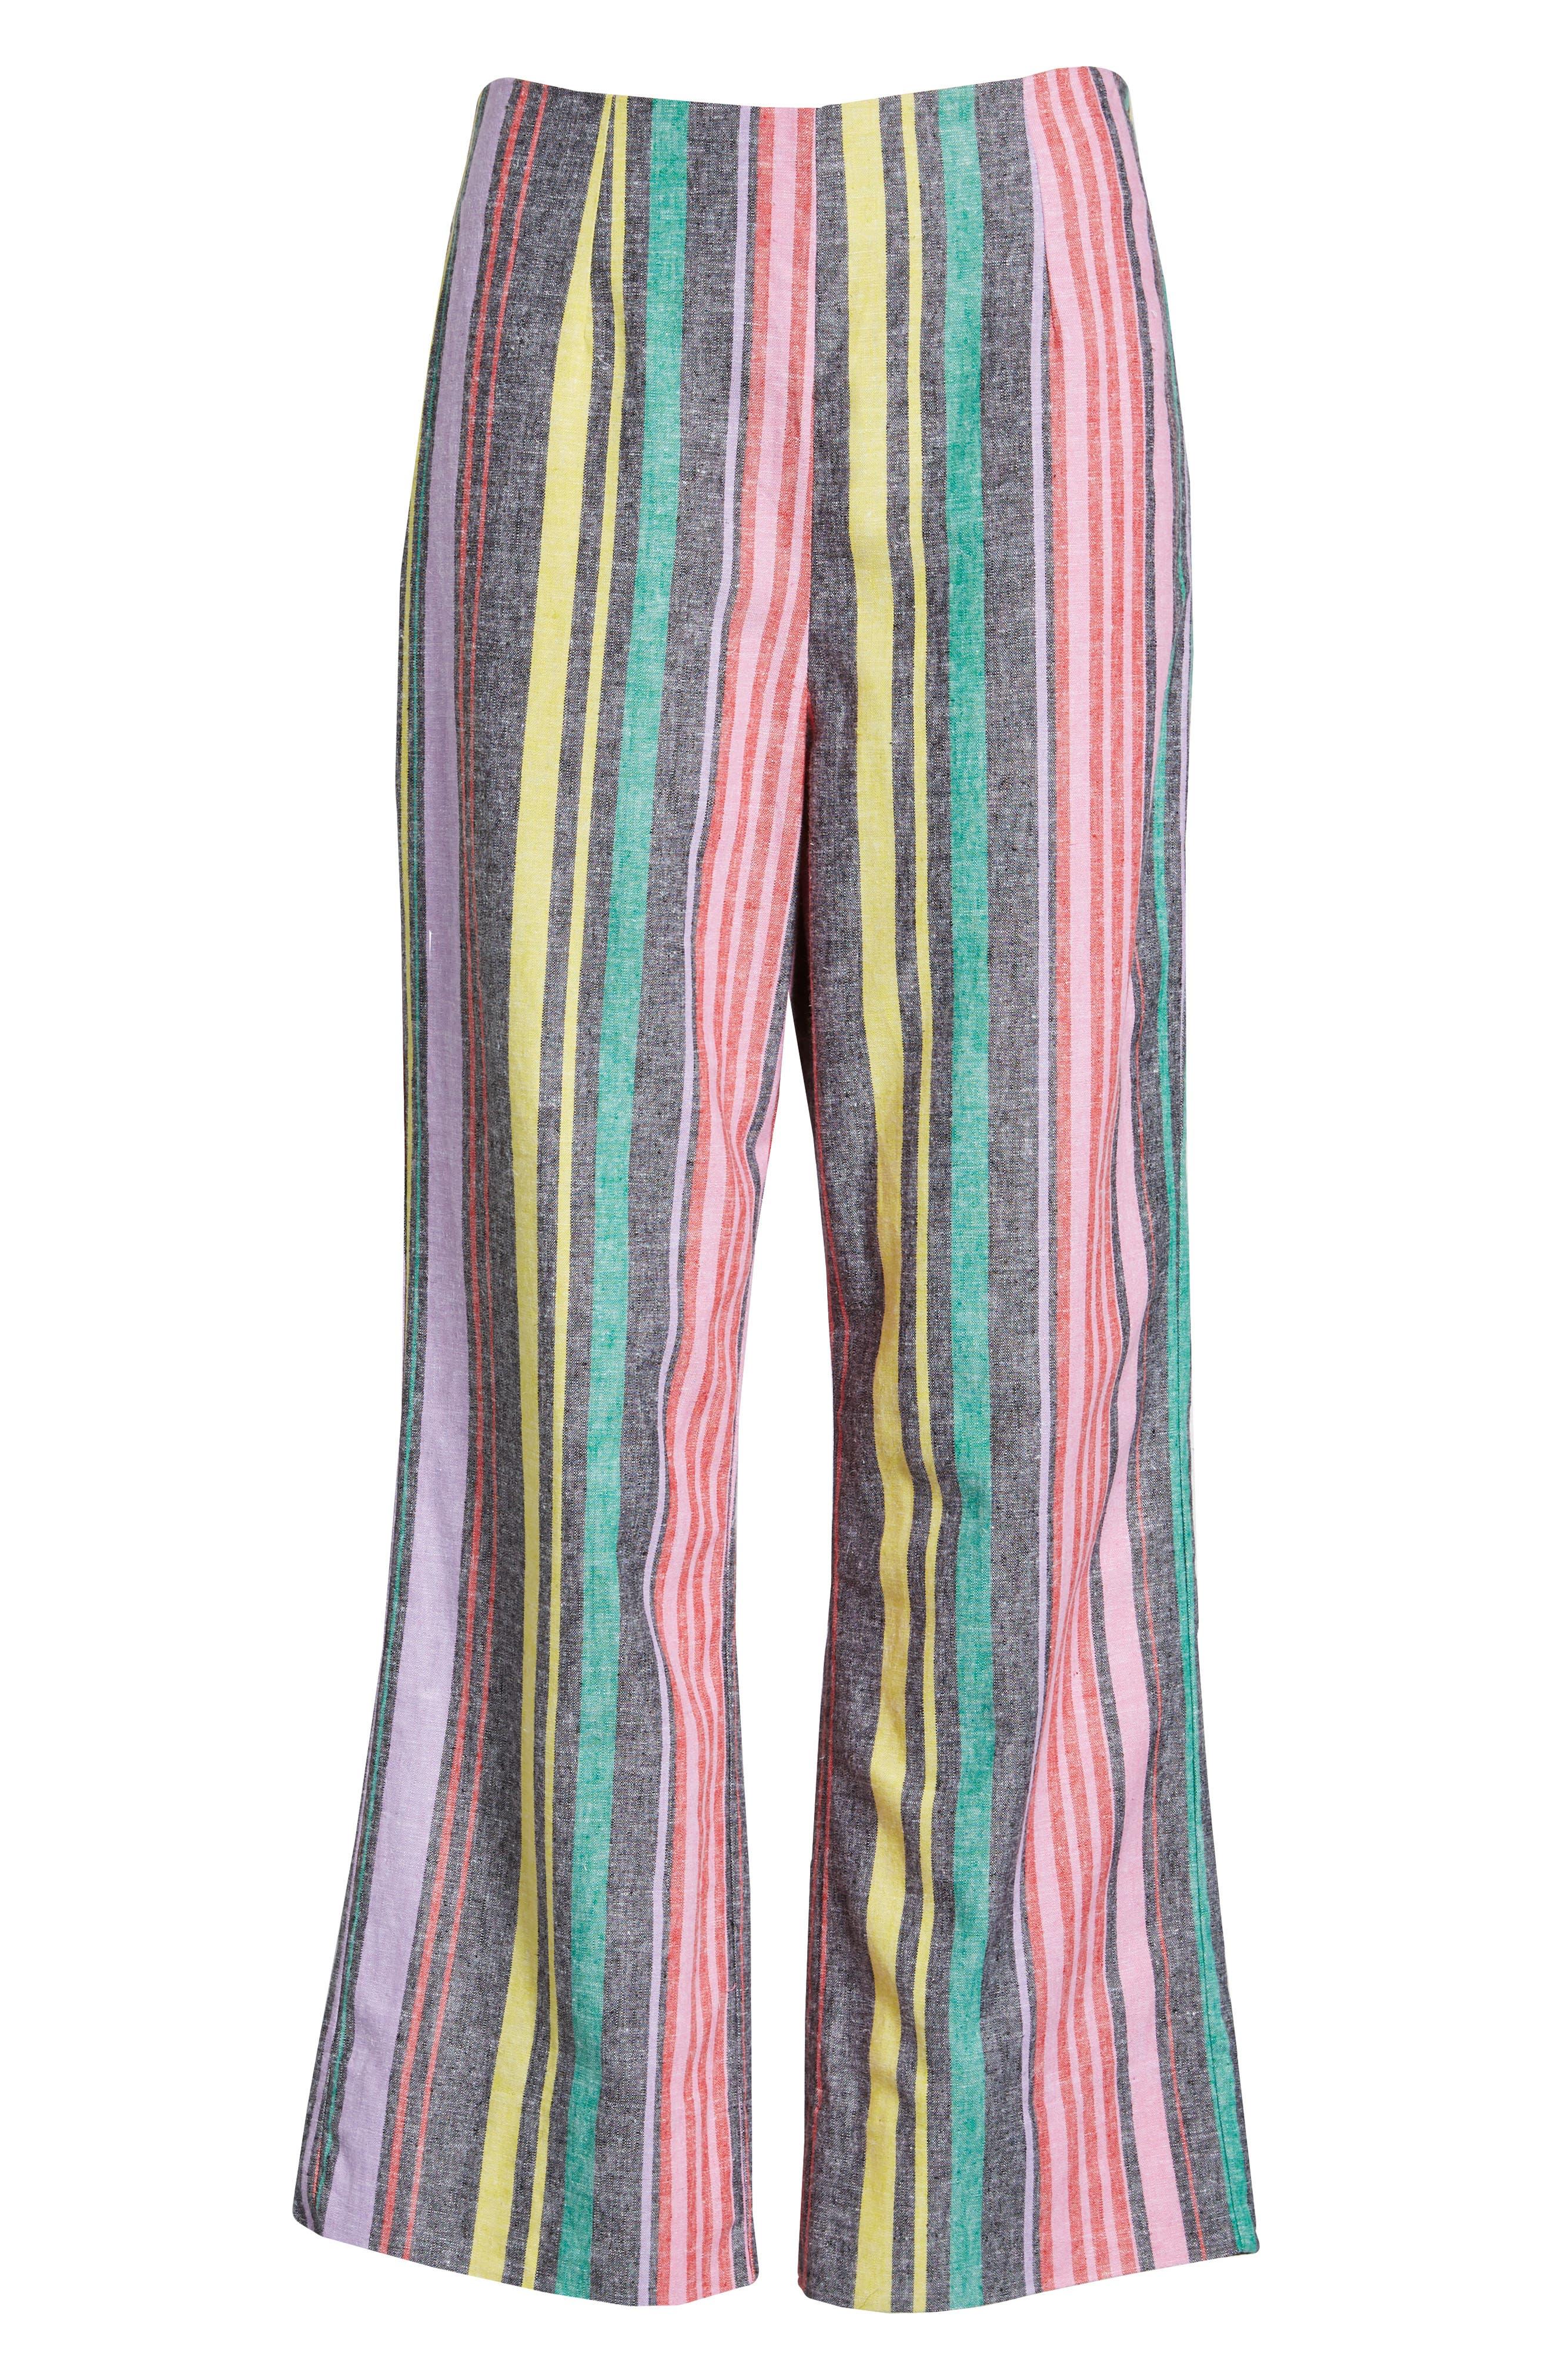 AFRM, Karina High Waist Crop Flare Pant, Alternate thumbnail 7, color, 650